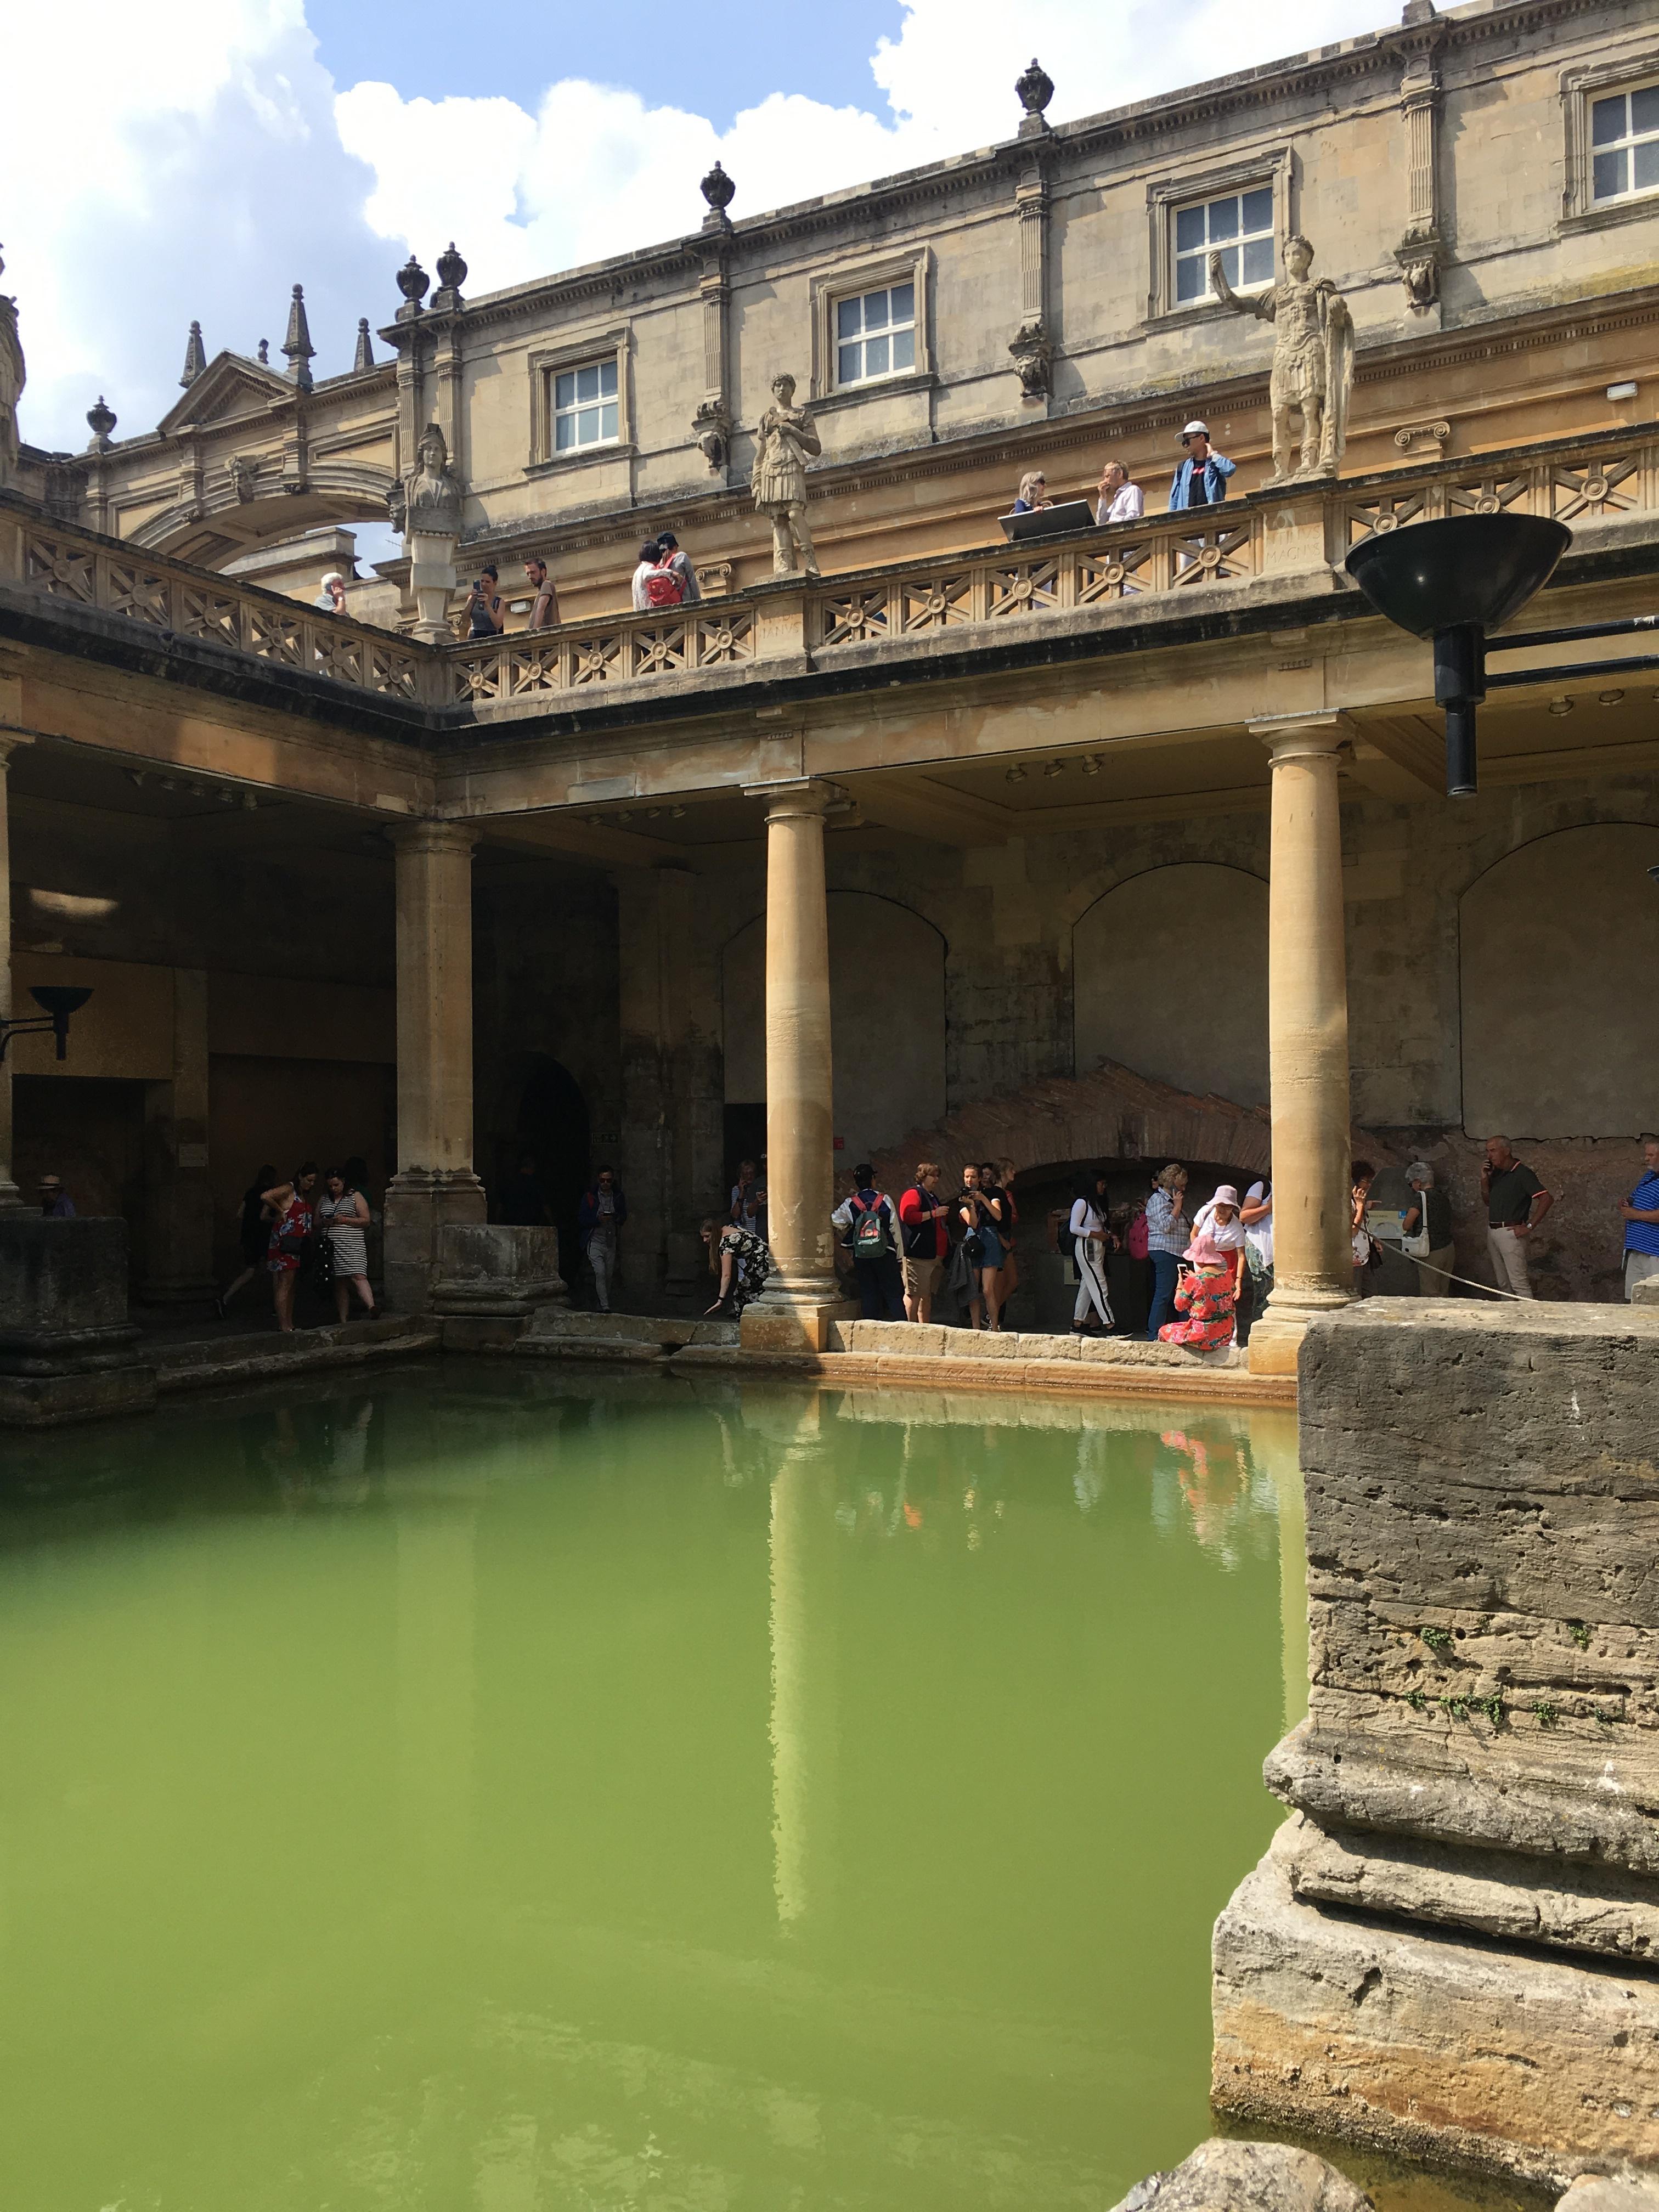 Roman bath image